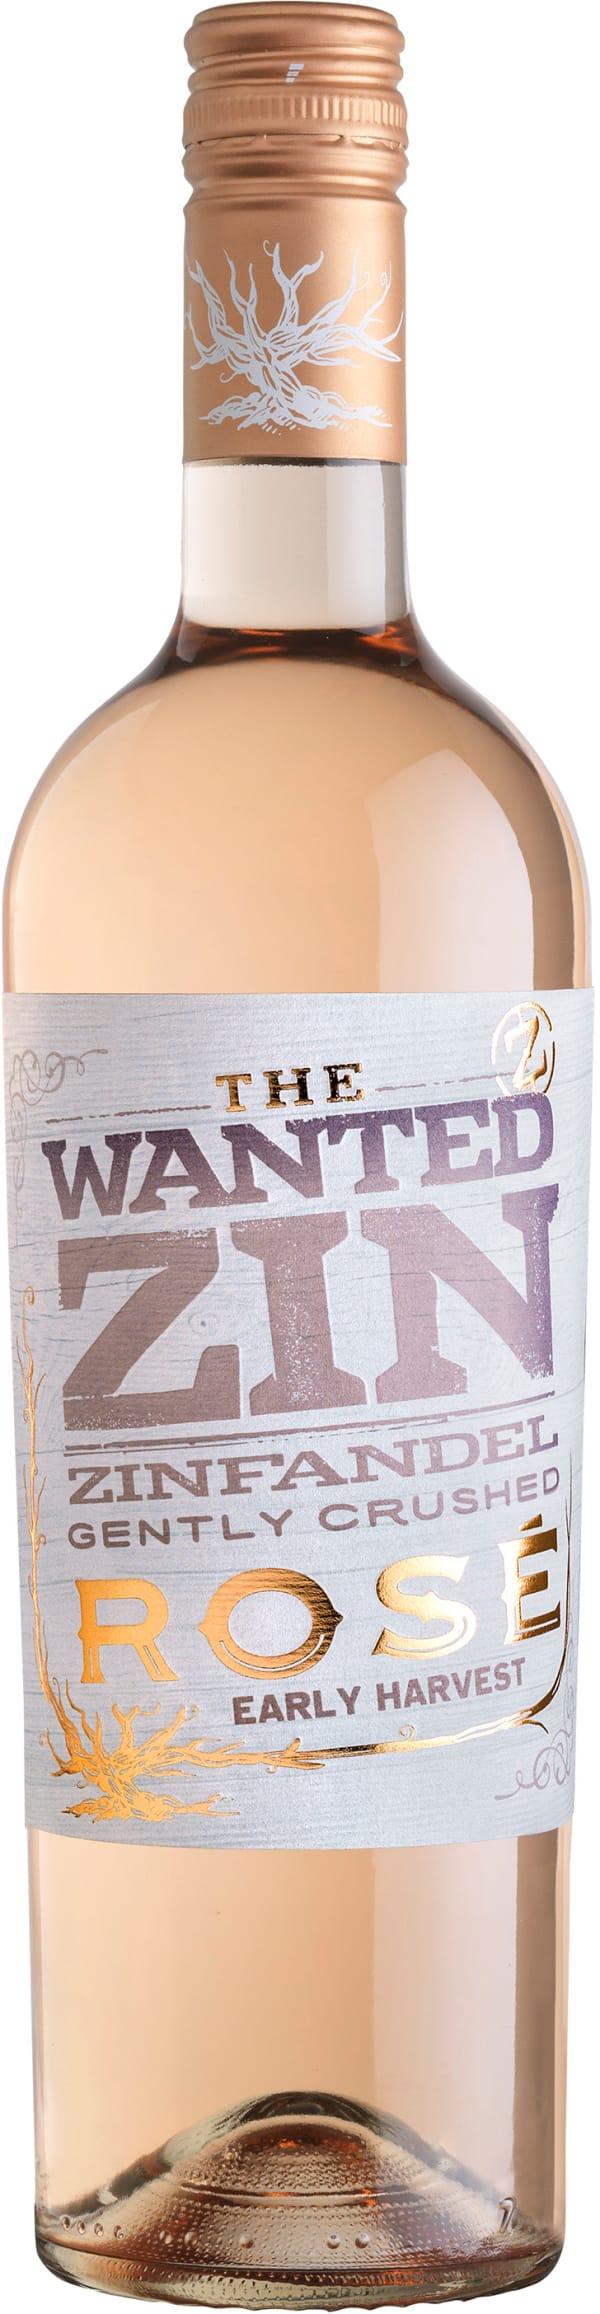 The Wanted Zin Blush Zinfandel 2016